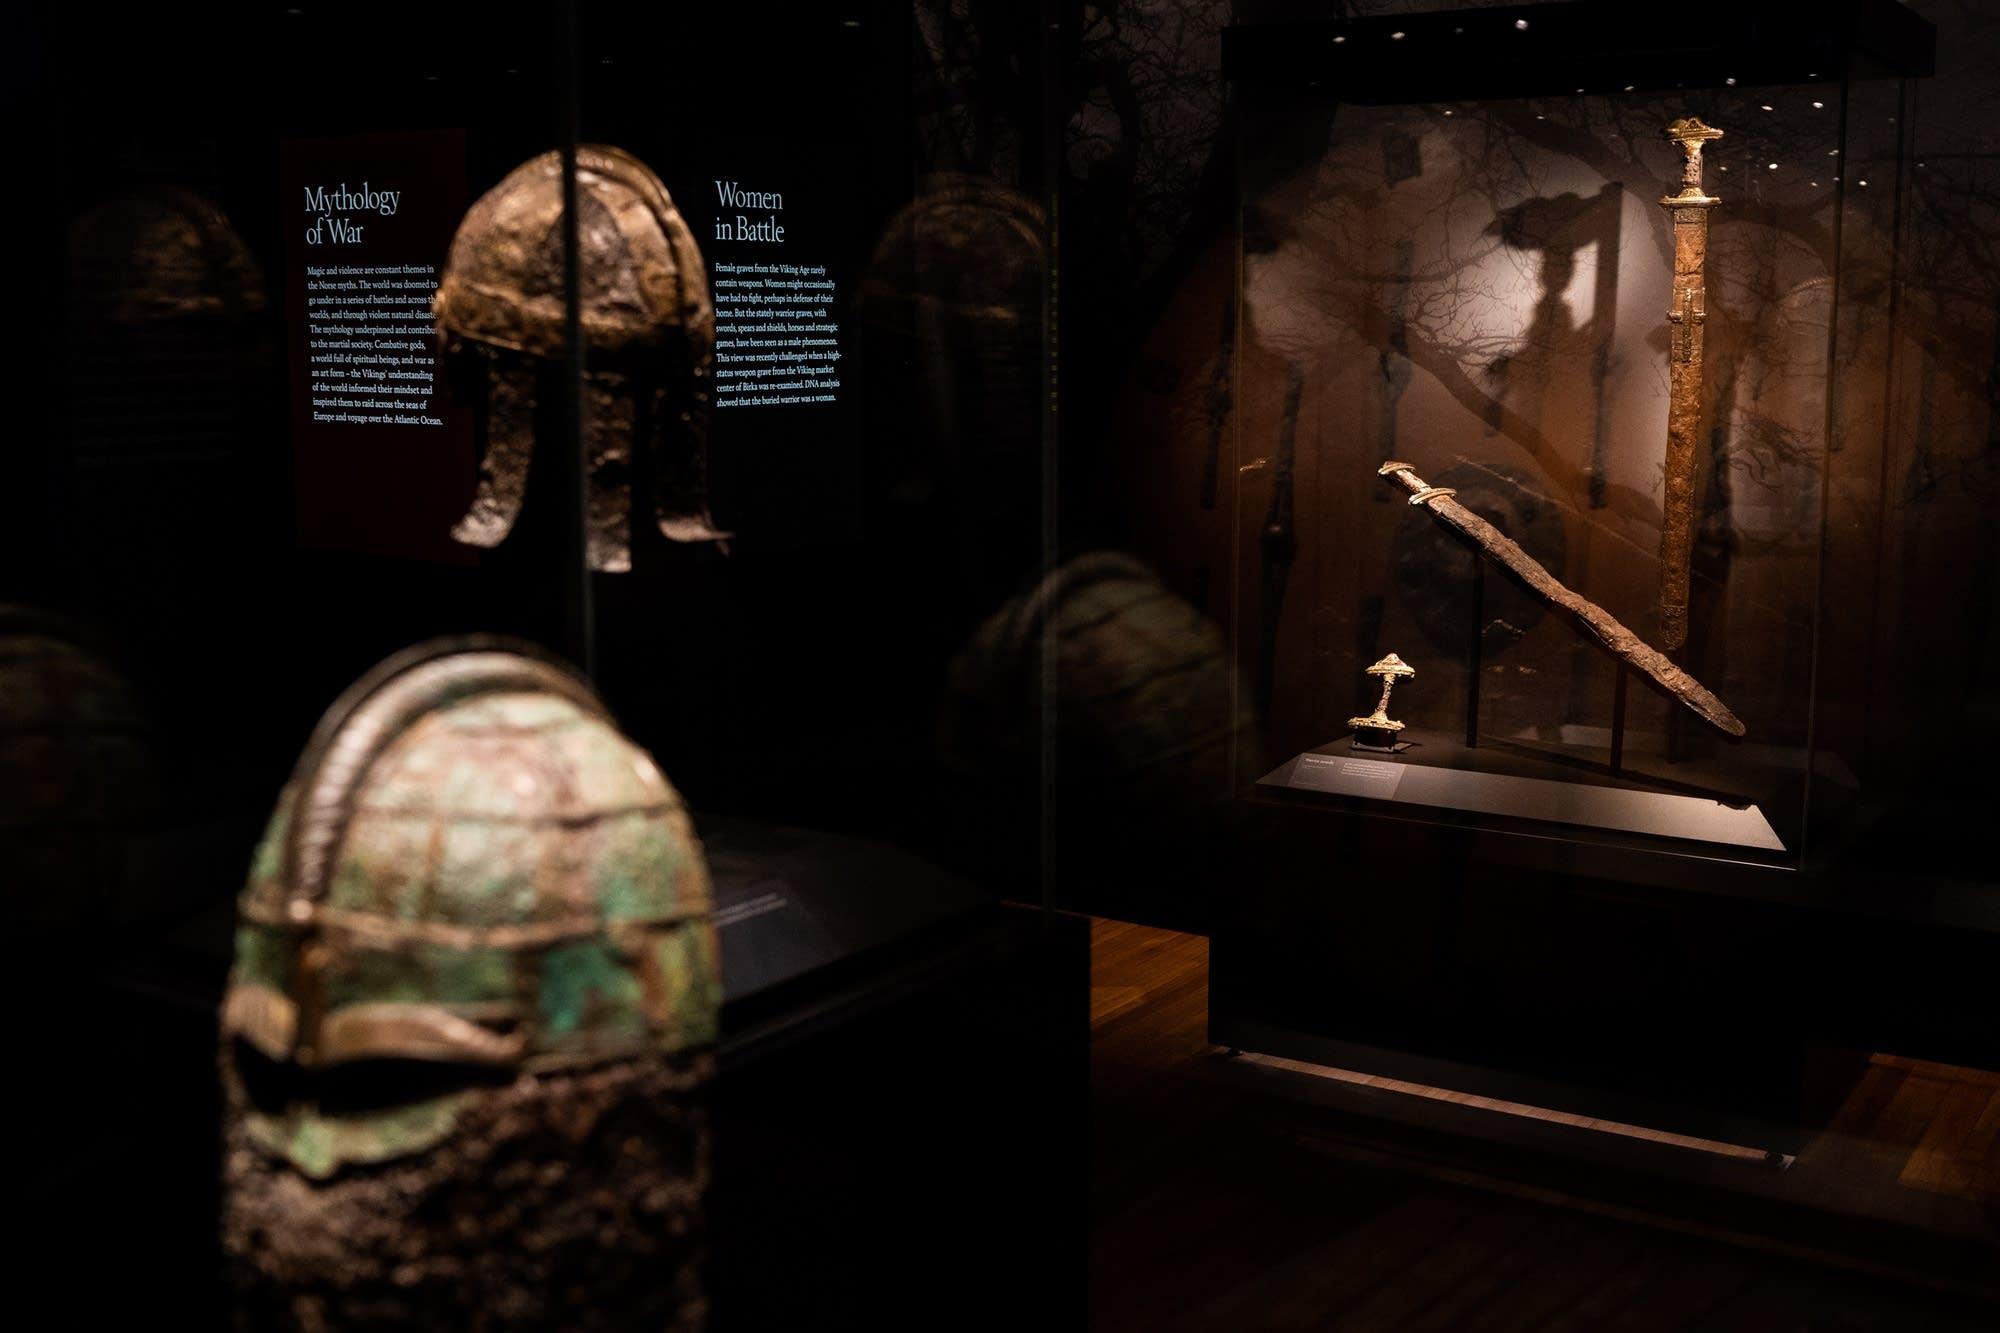 Viking helmets and swords sit on display.